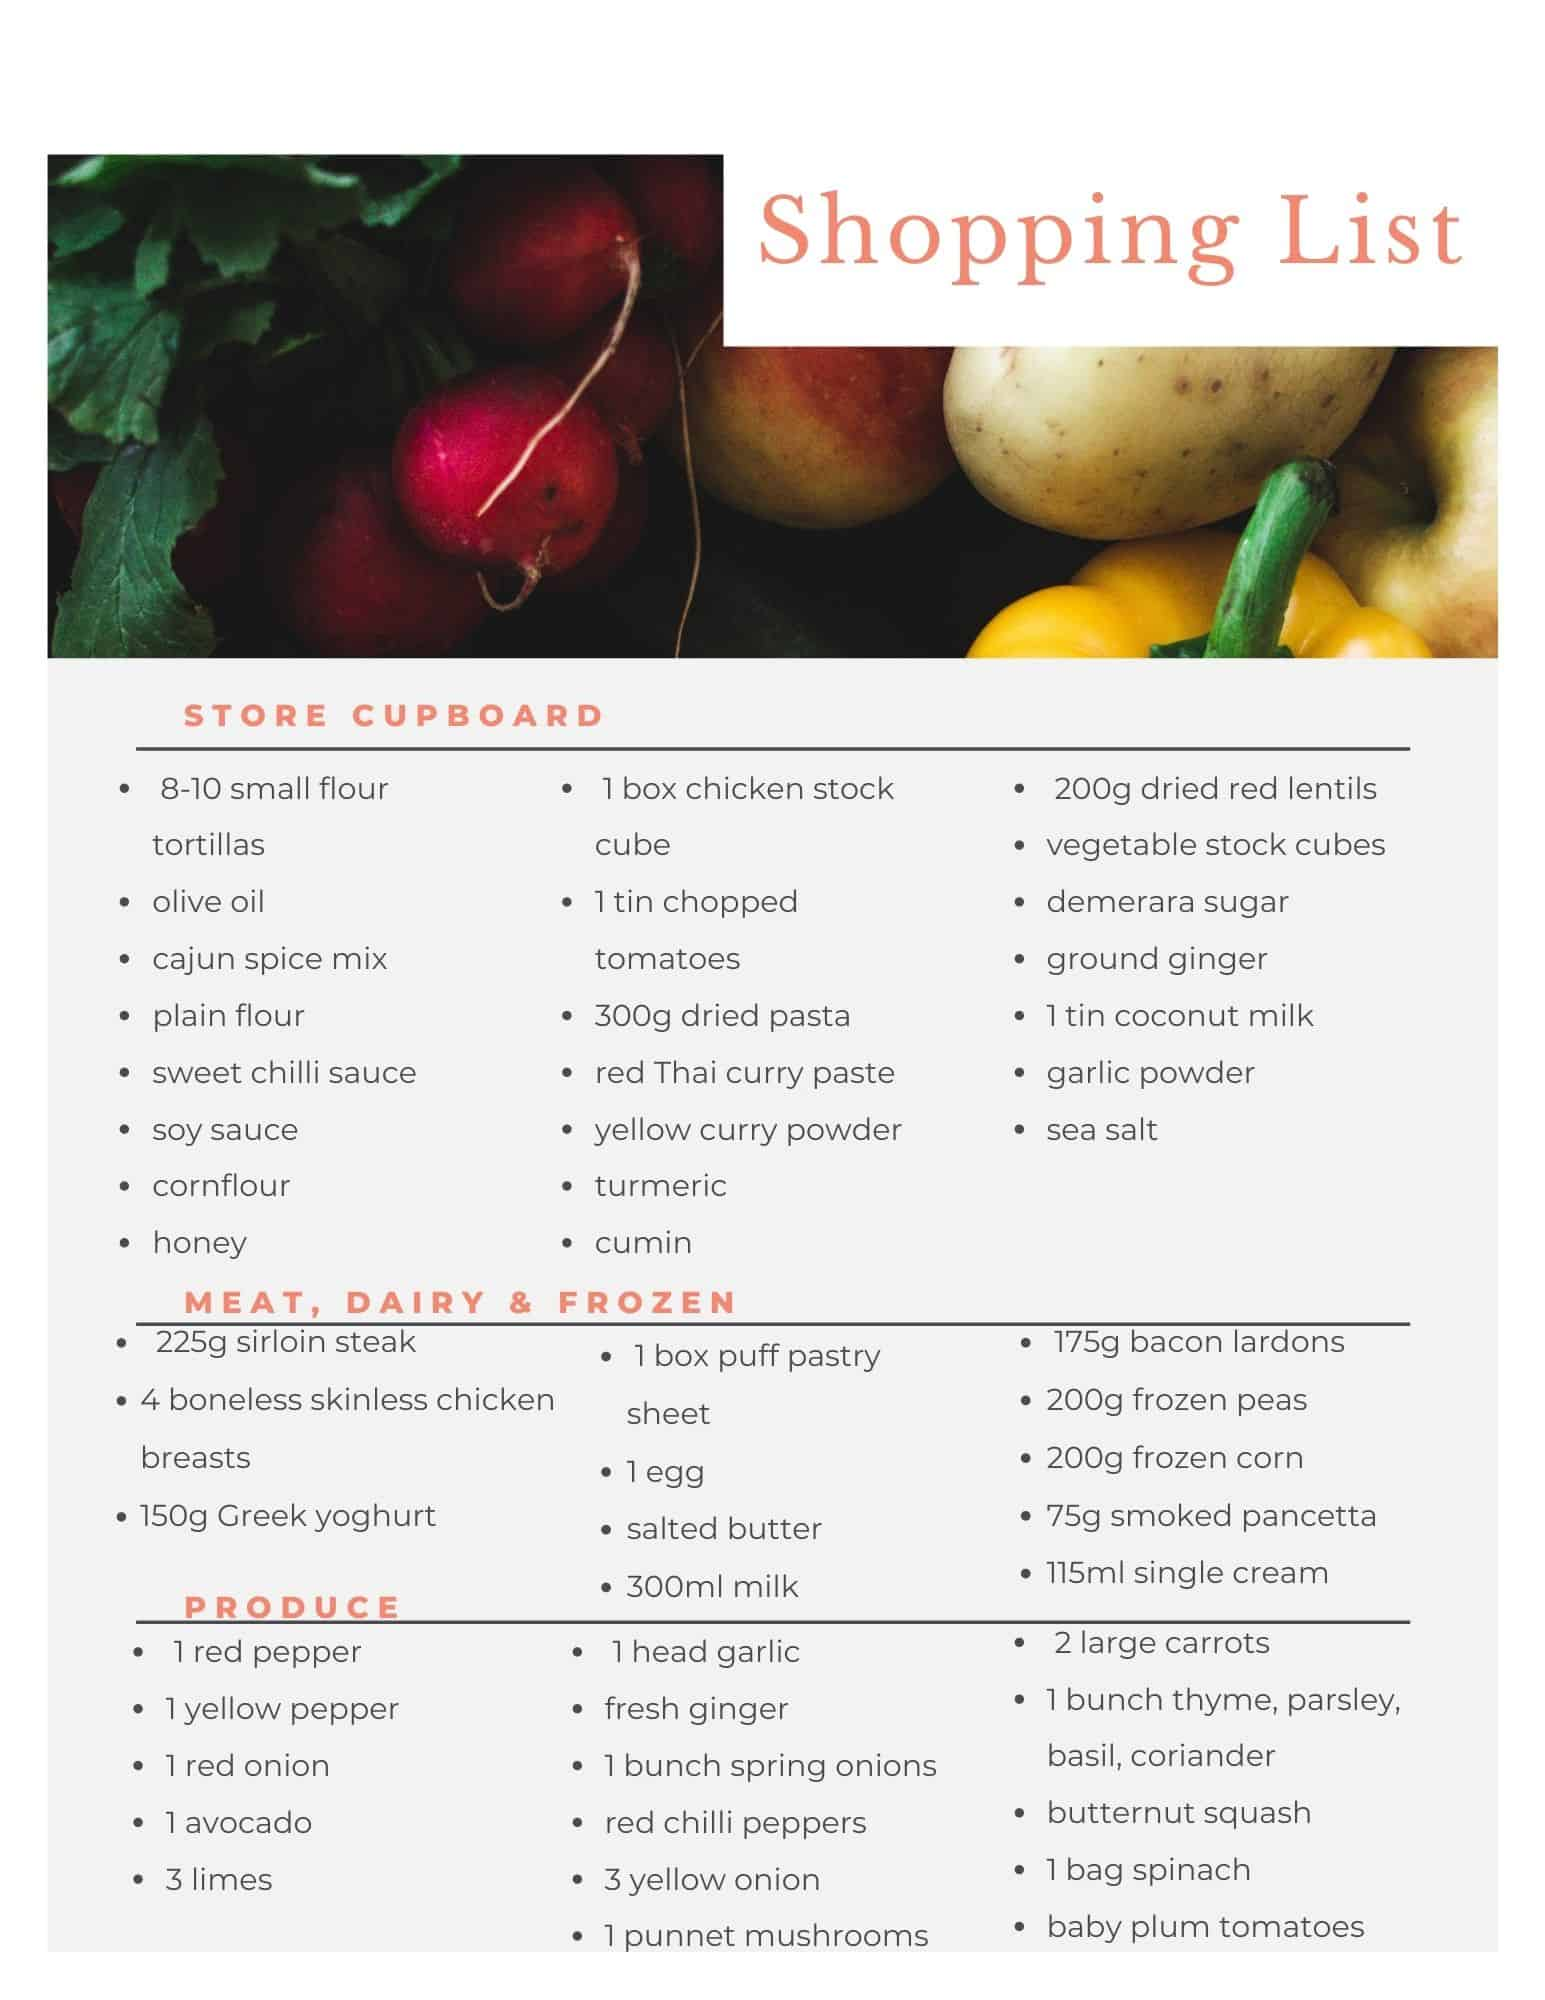 Aldi budget meal plan shopping list.